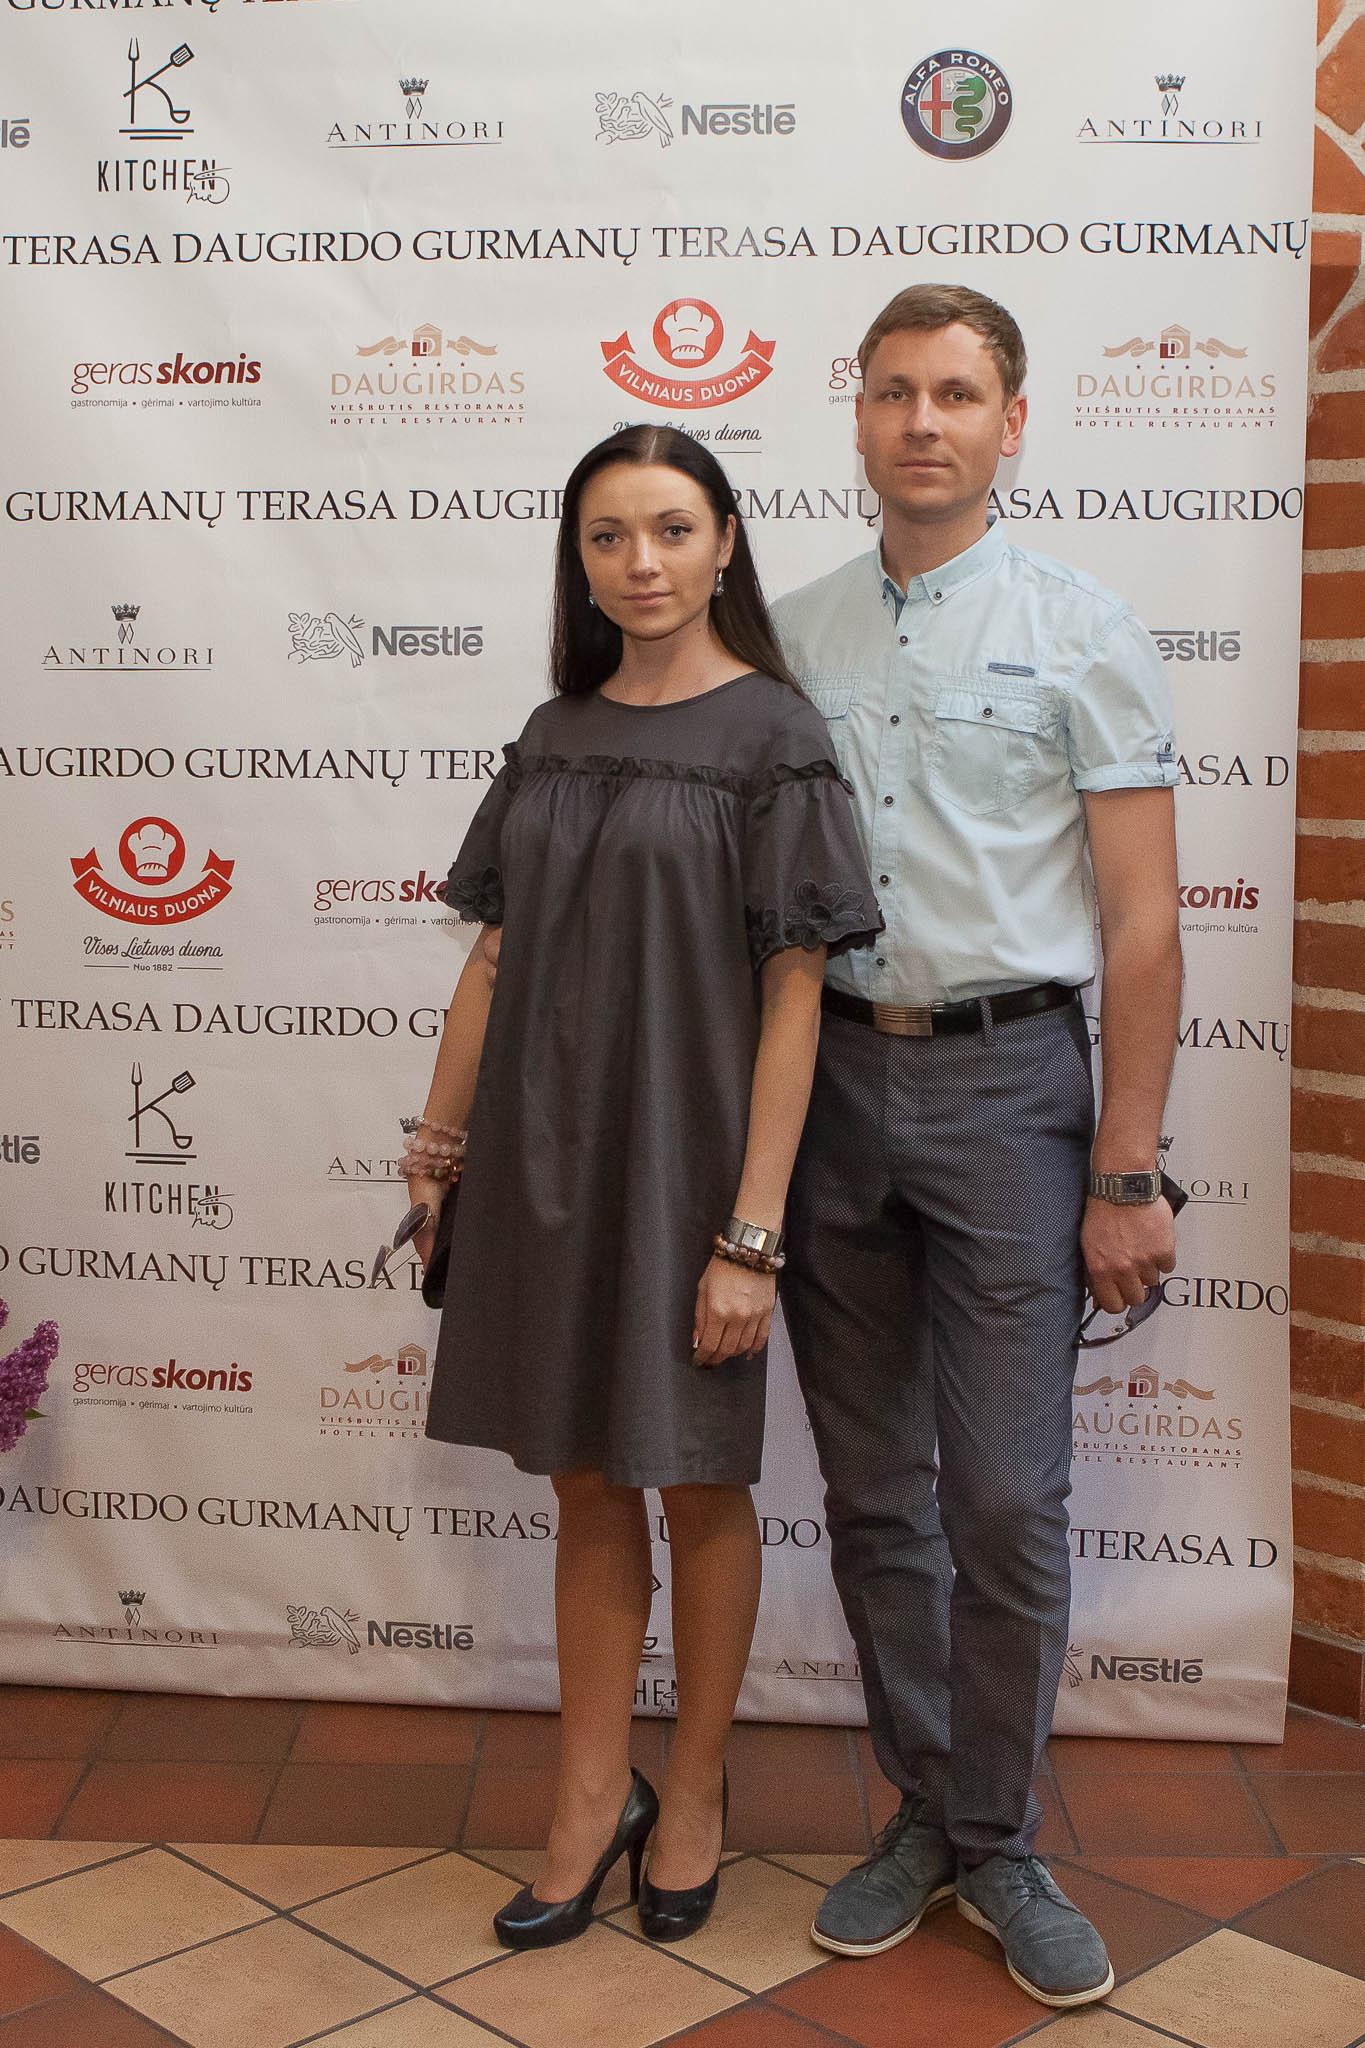 """Gero skonio"" klubo metu atidaryta ""Gurmanų terasa"" (foto: D. Gumbrevičius)"